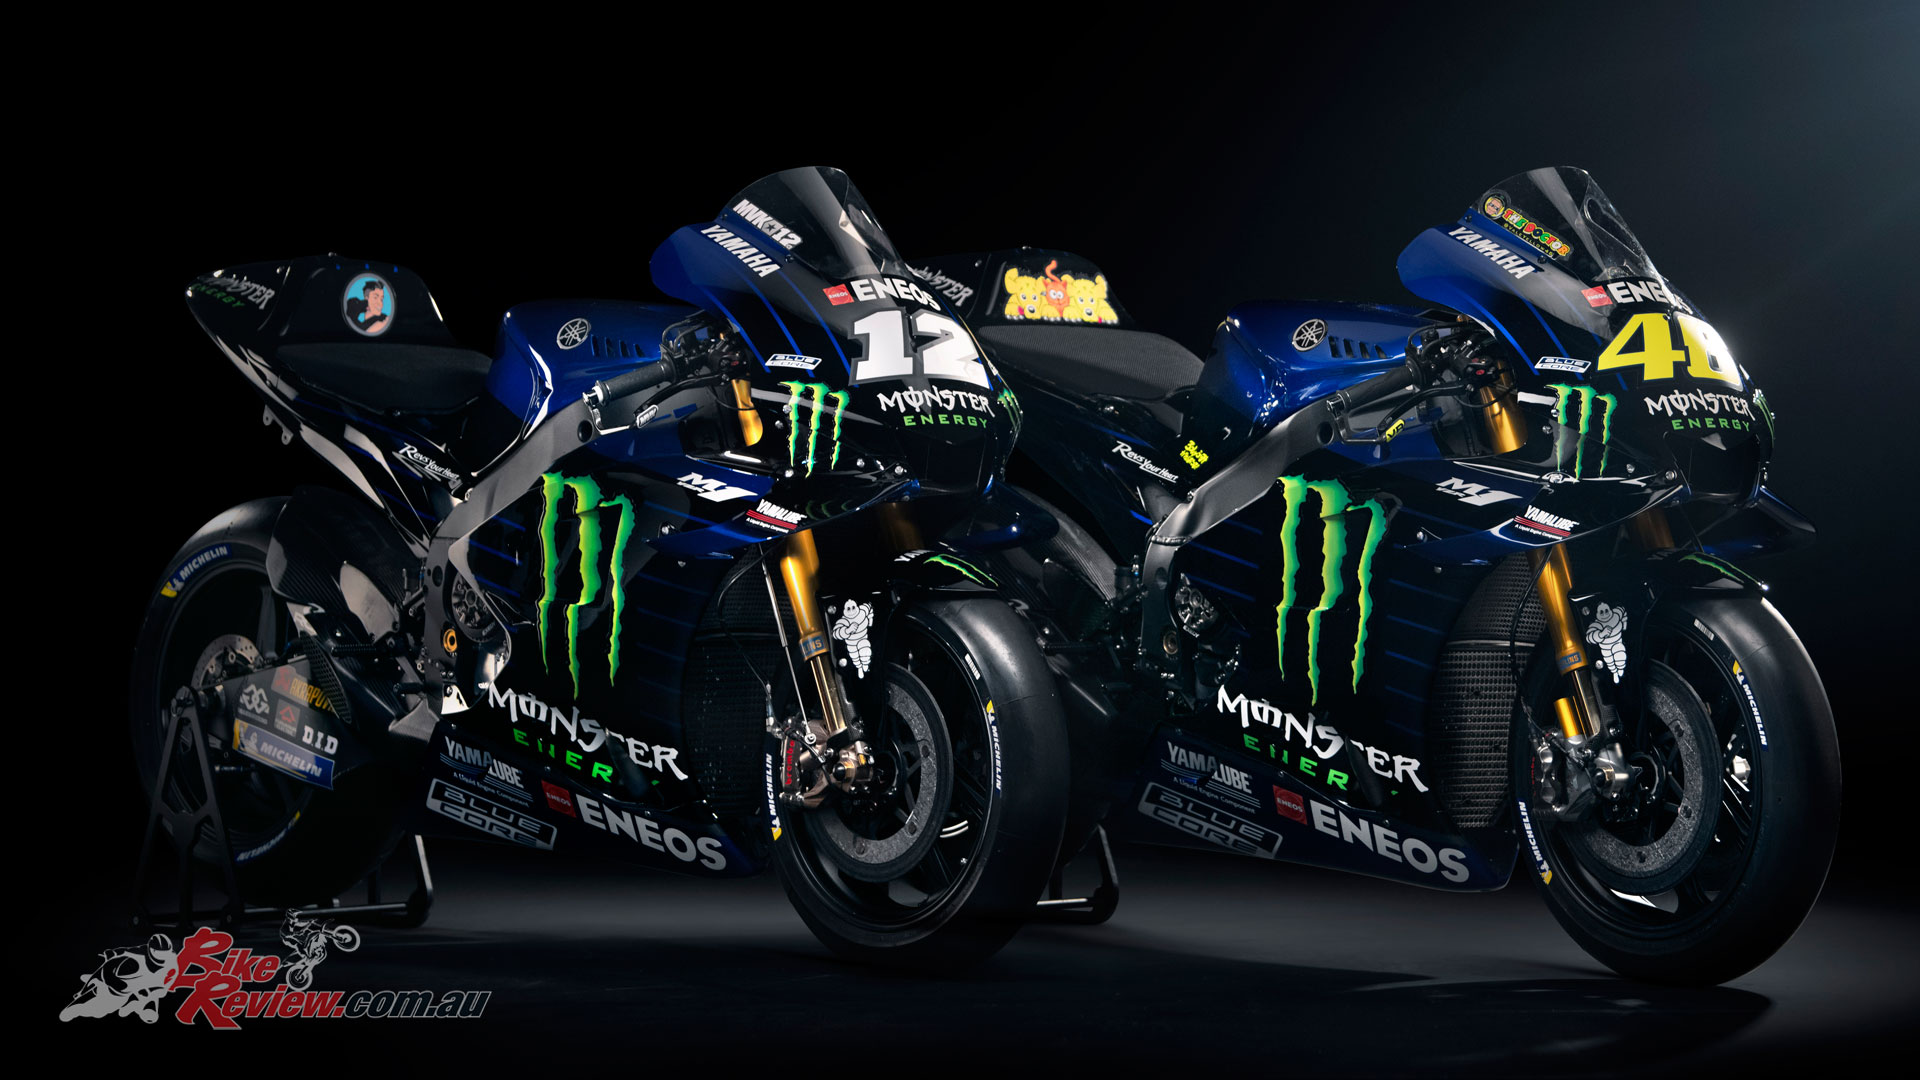 2019 Monster Energy Yamaha MotoGP Team